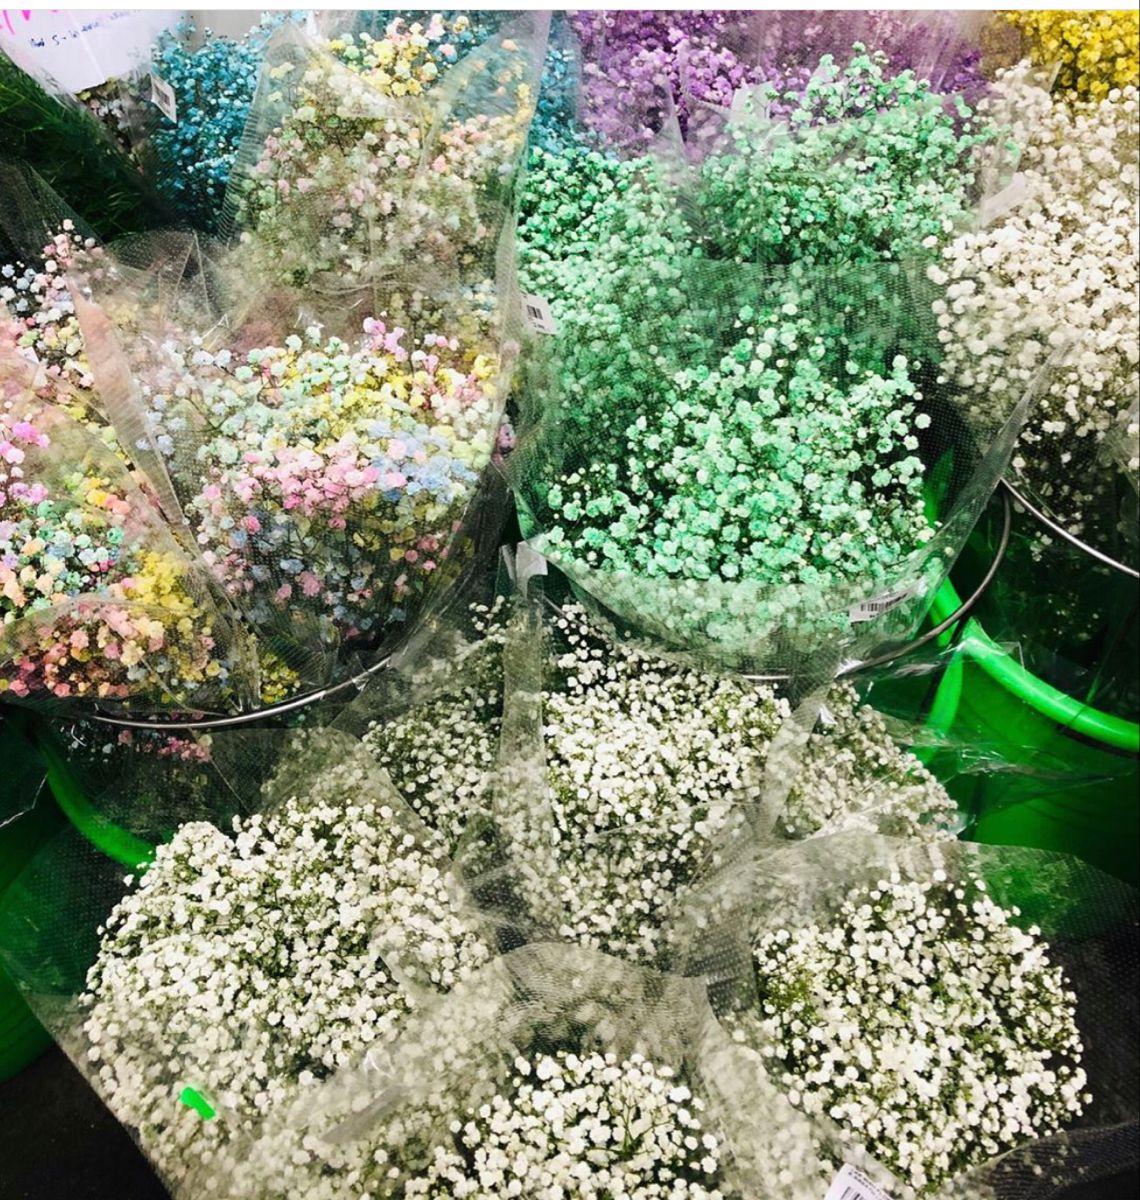 Baby Breath Flowers In 2020 Flowers For Sale Baby S Breath Wedding Flowers Babys Breath